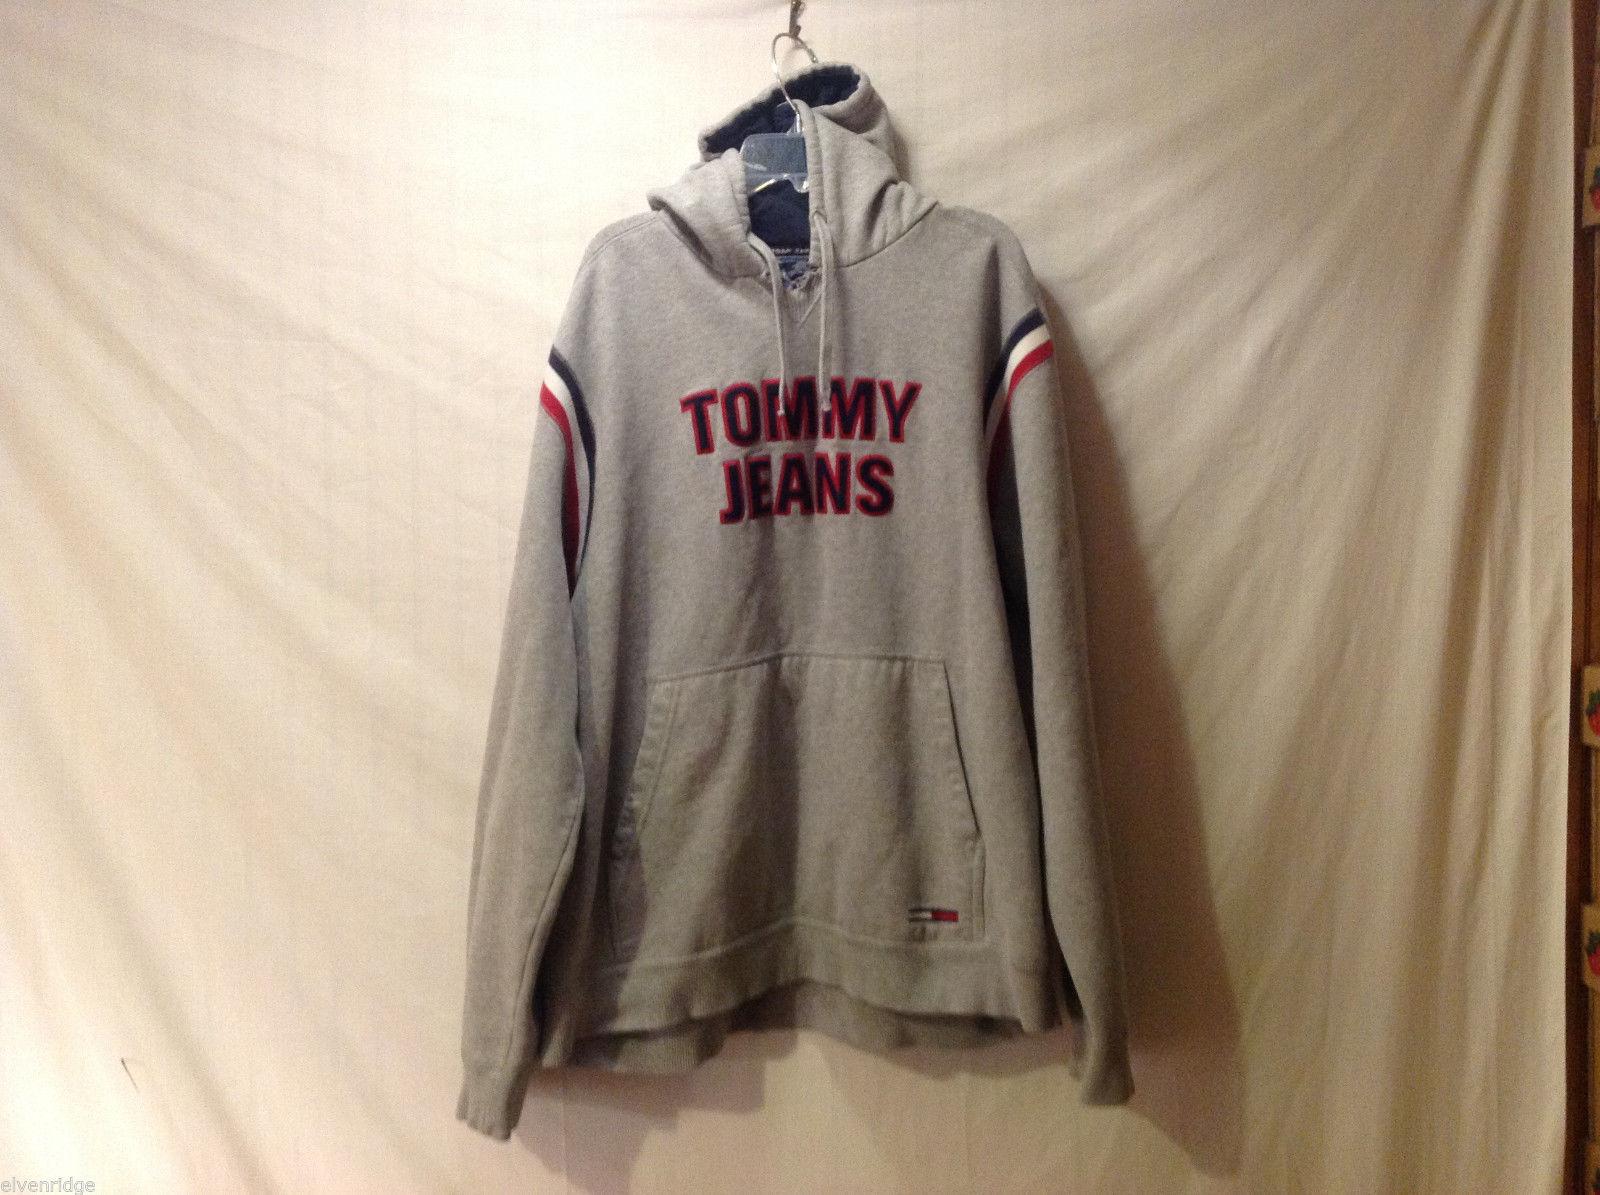 Tommy Hilfiger Jeans Men's XXL Hoodie Gray w/ Stripes Pocket Sweatshirt Pullover